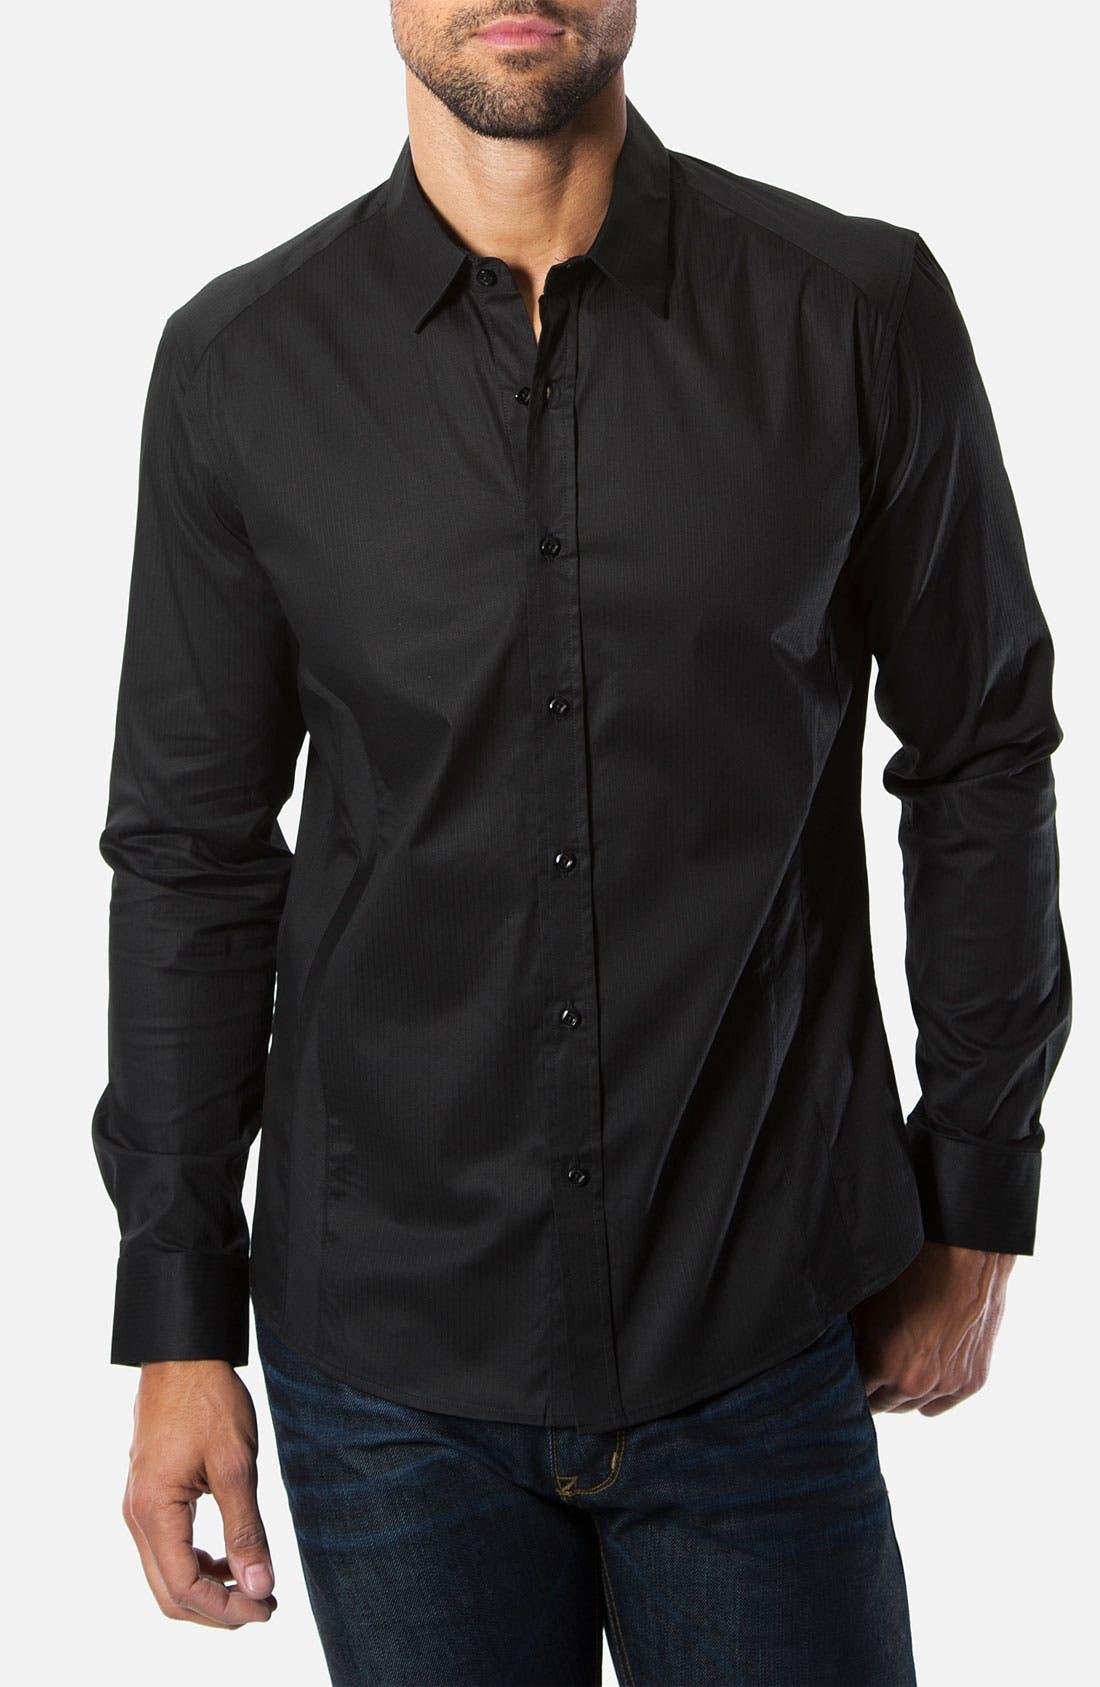 Alternate Image 1 Selected - 7 Diamonds 'Diamond Eyes' Trim Fit Cotton Blend Sport Shirt